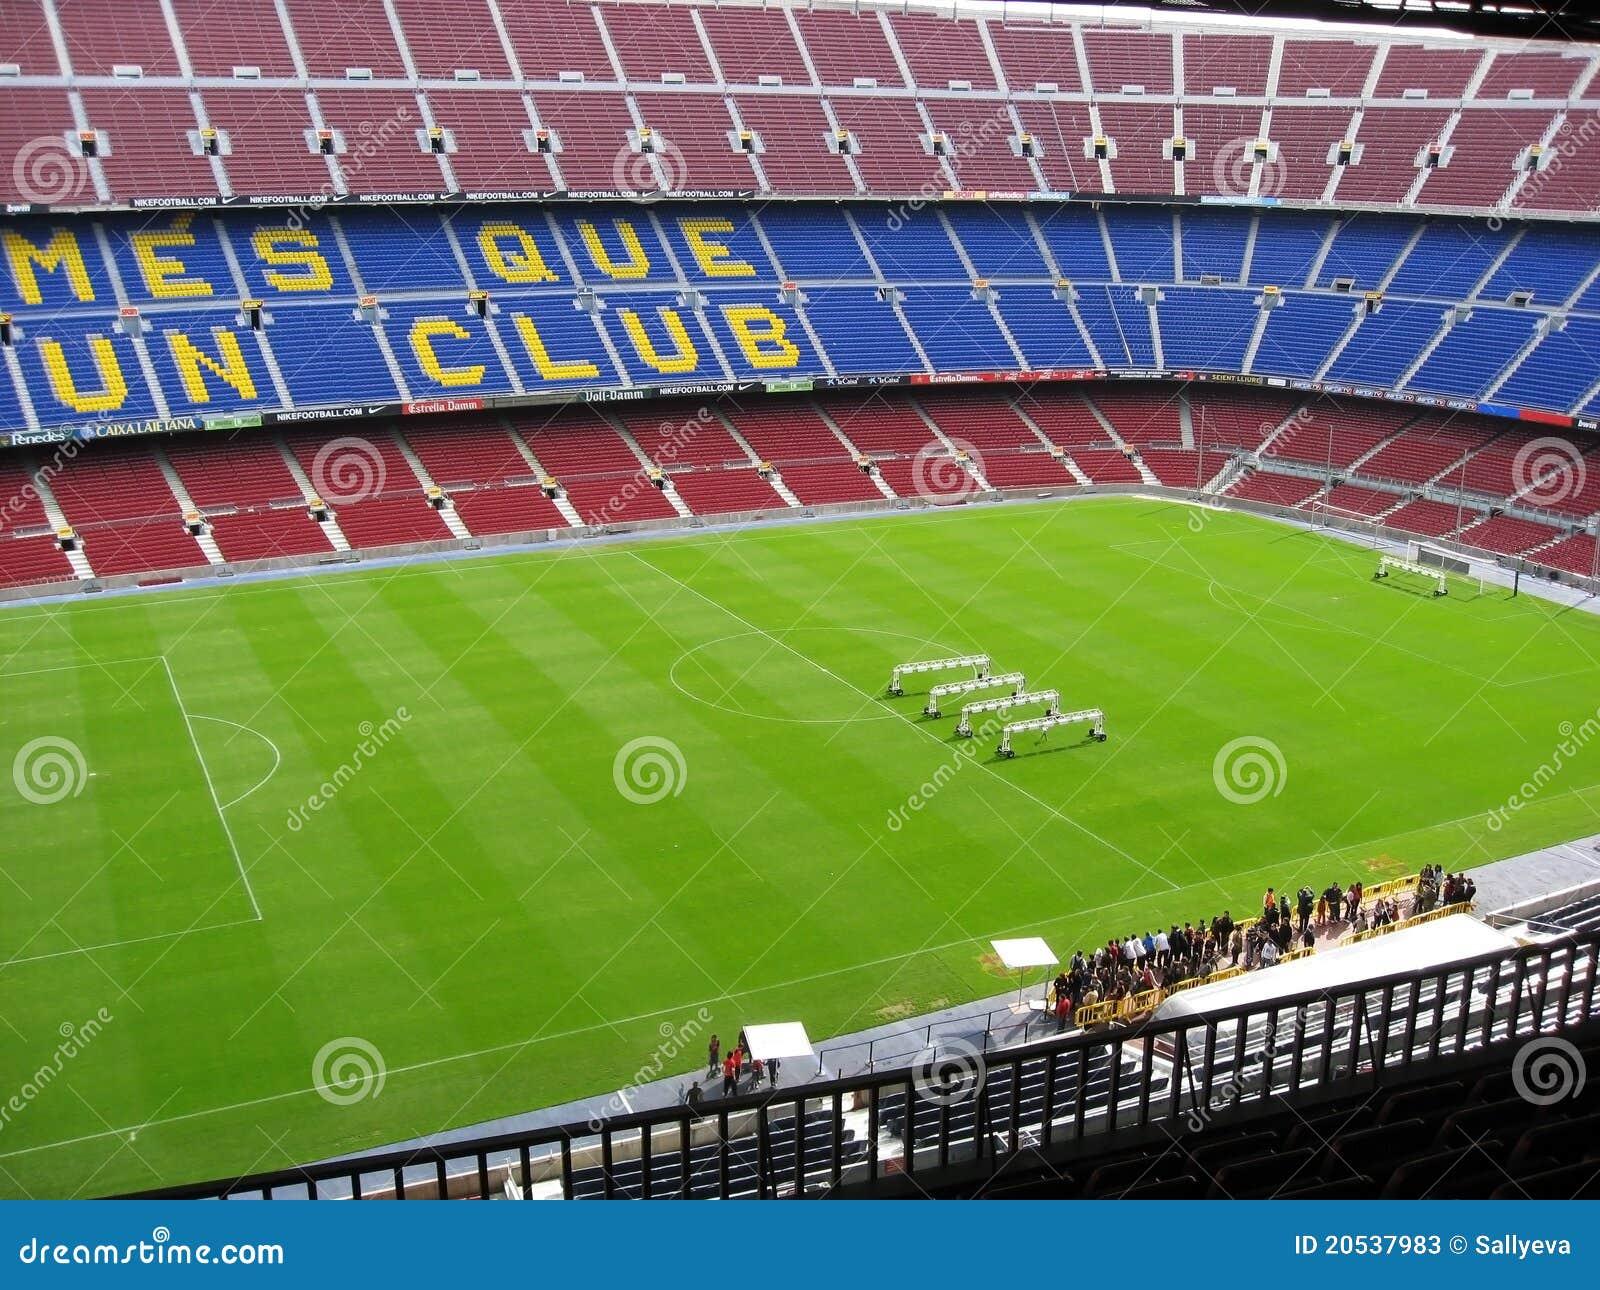 Image Result For Football Club Barcelona Stadium